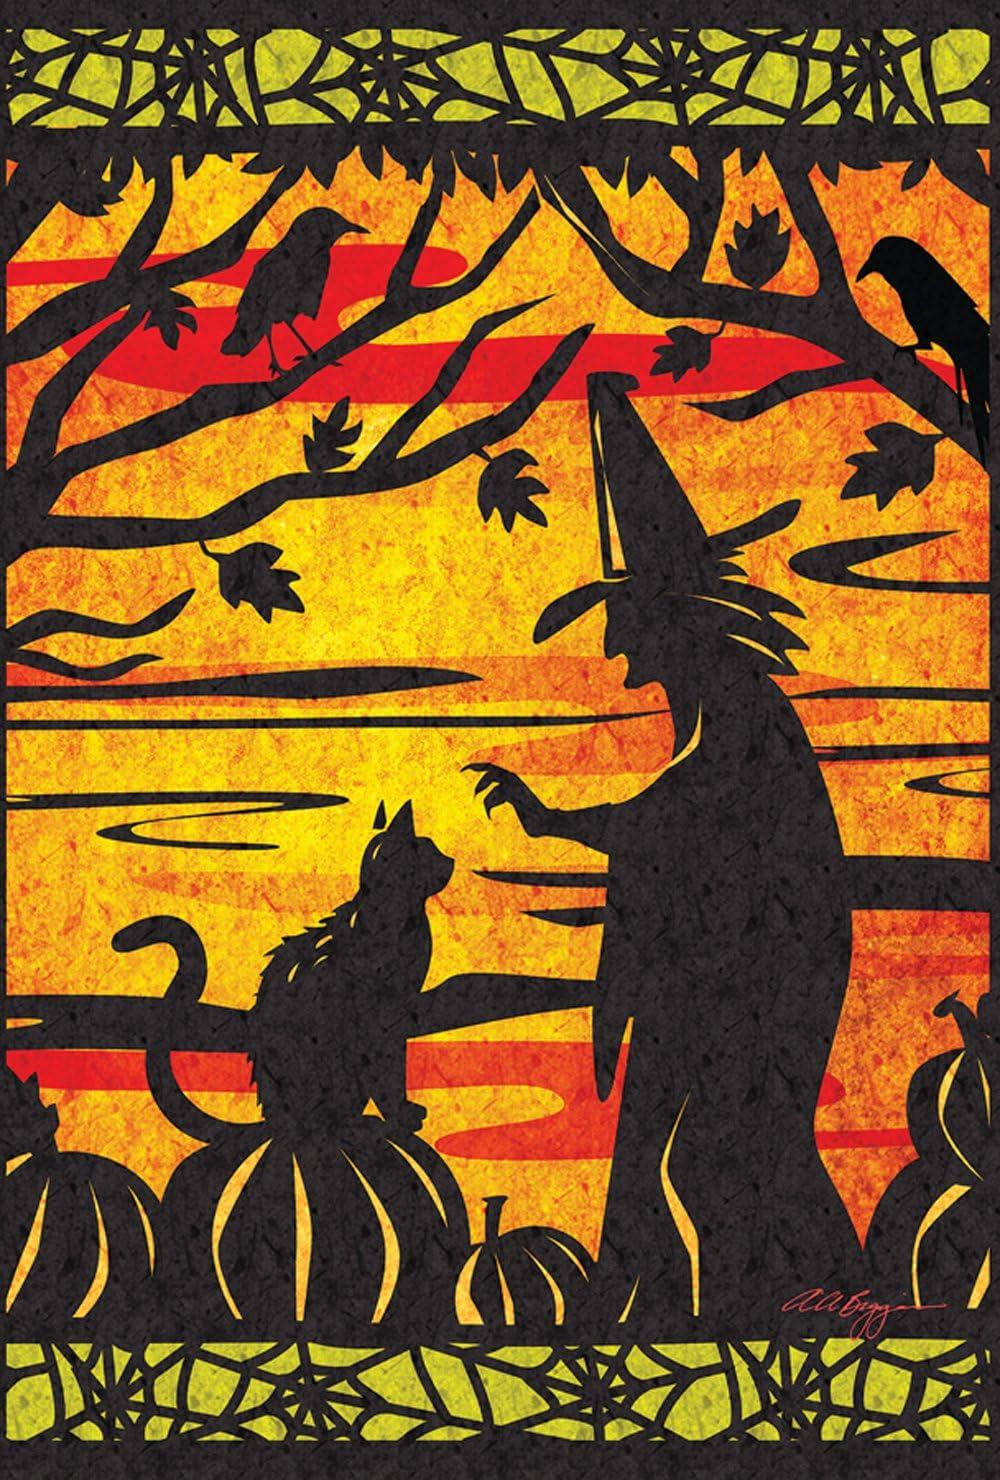 Toland Home Garden Witch's Best Friend 28 x 40 Inch Decorative Halloween Witch Cat House Flag